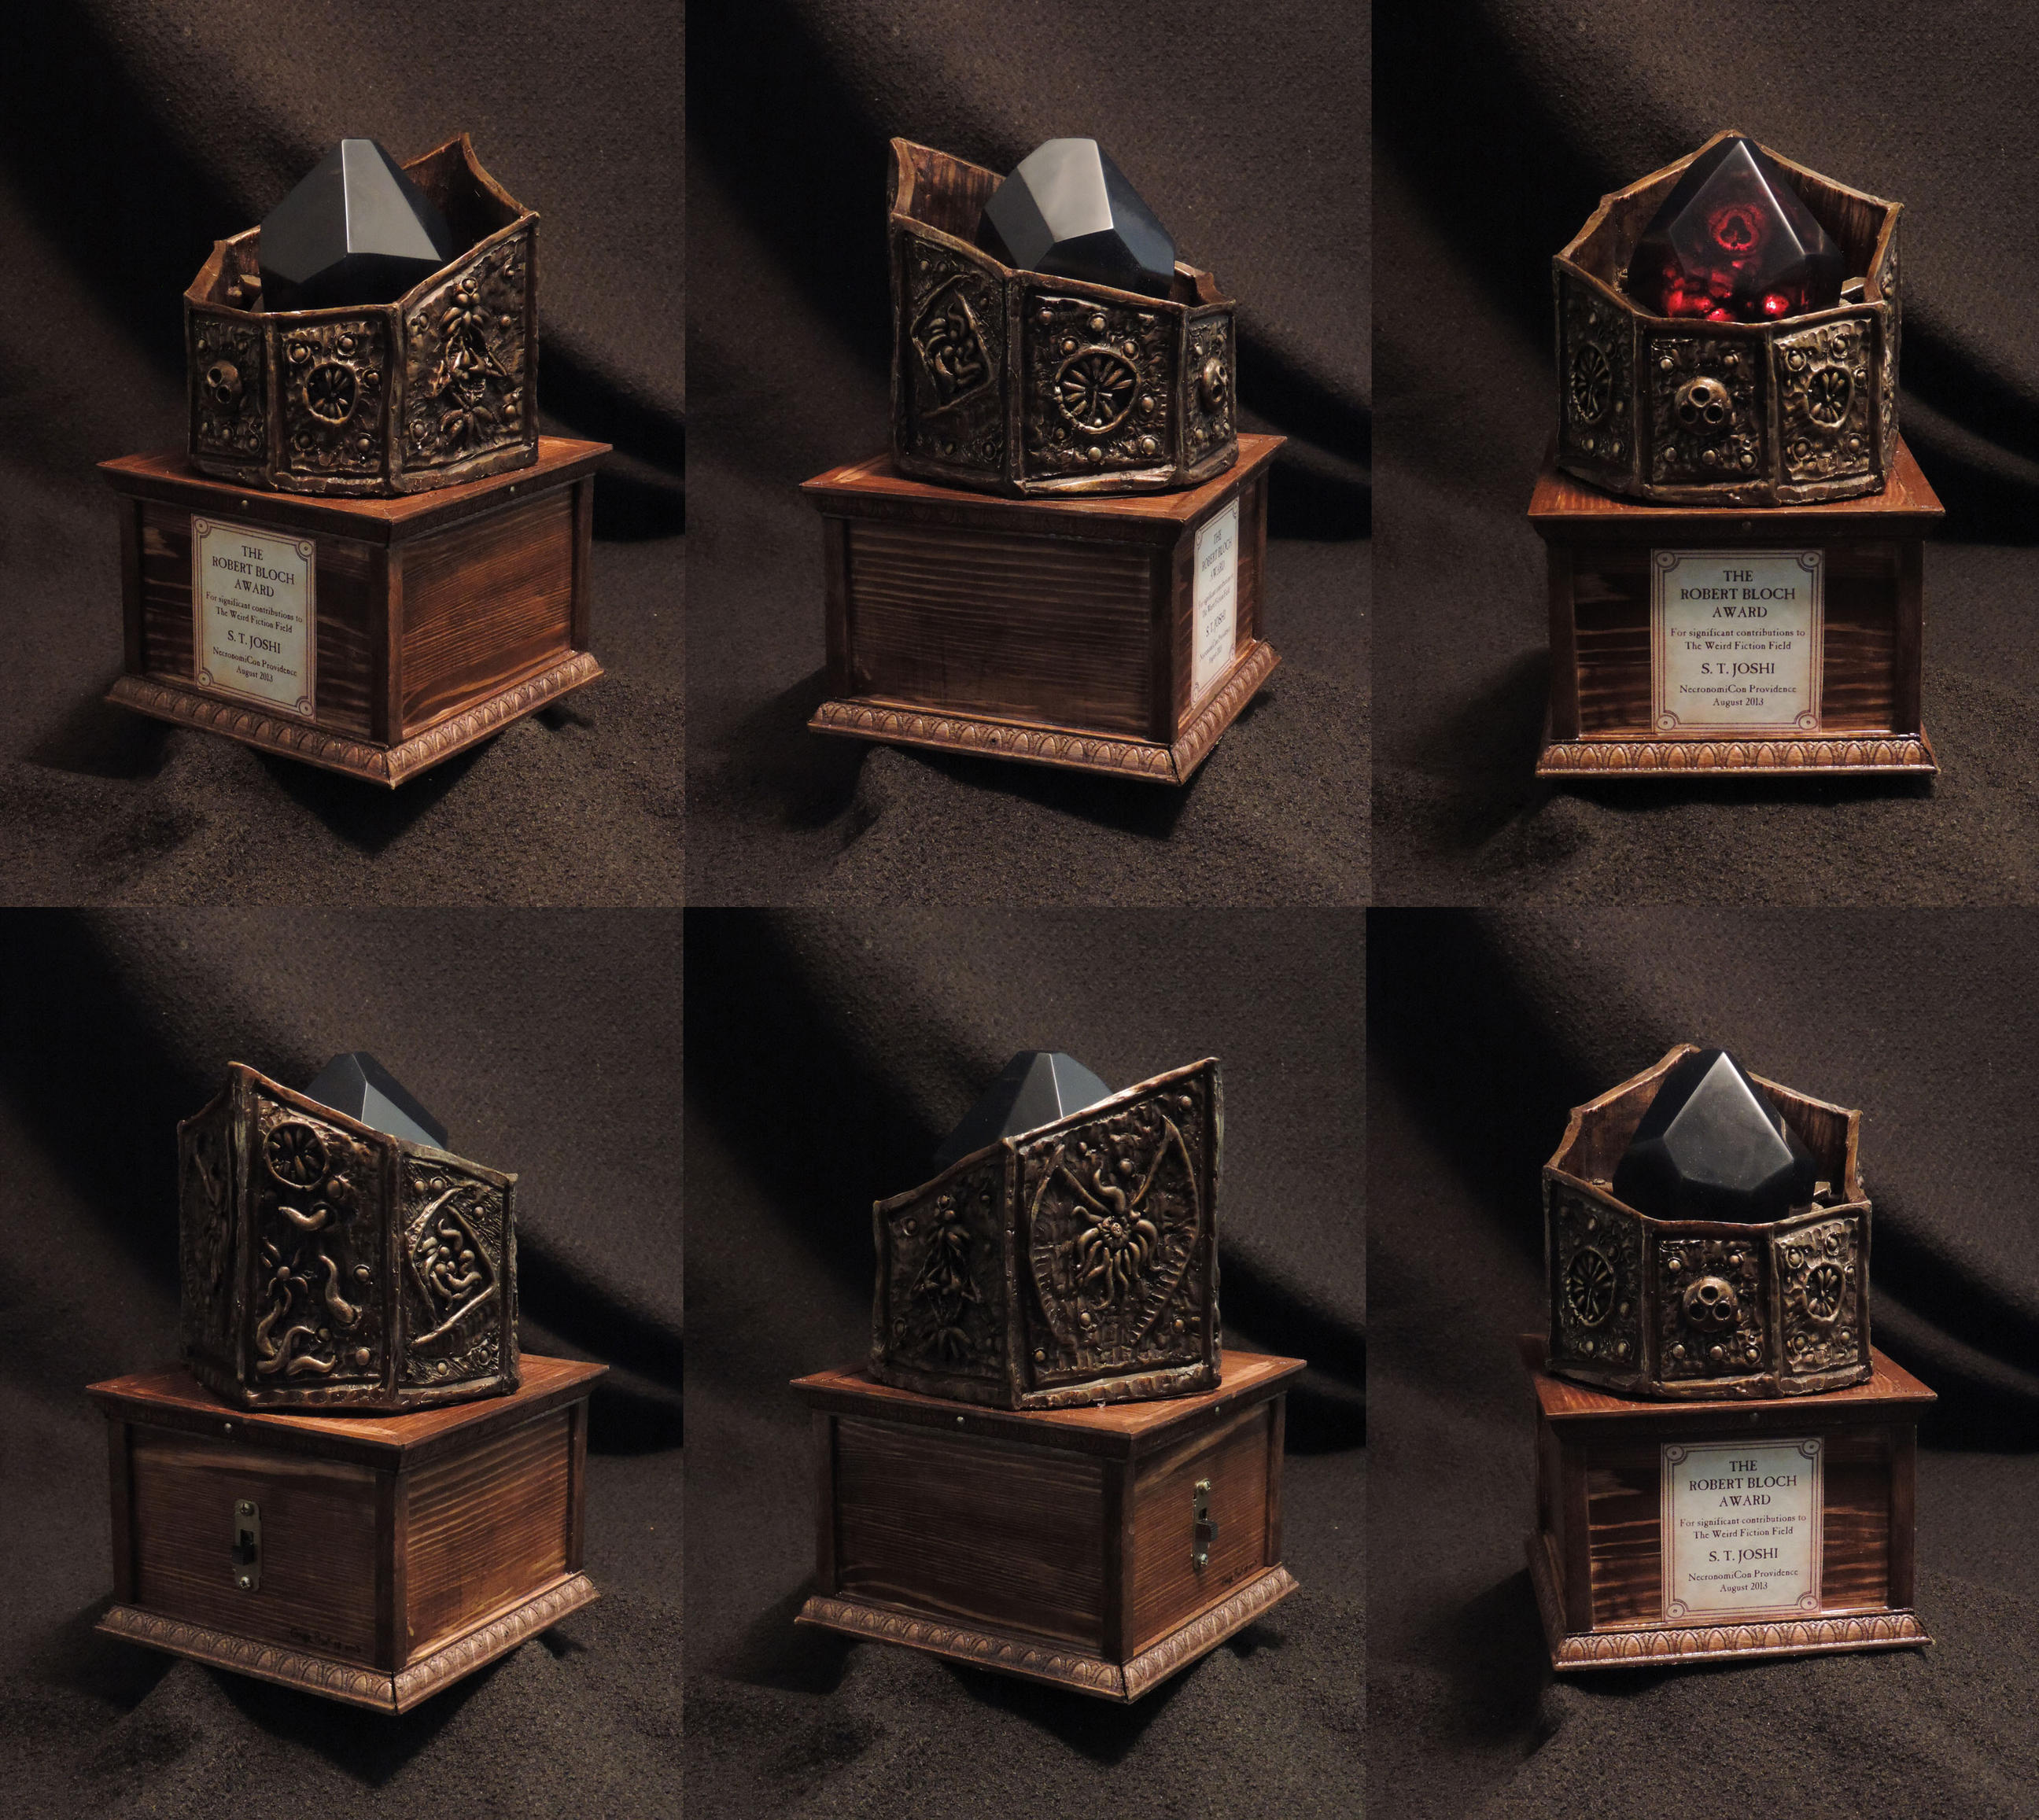 The Robert Bloch Award-The Haunter Of The Dark by Legiongp